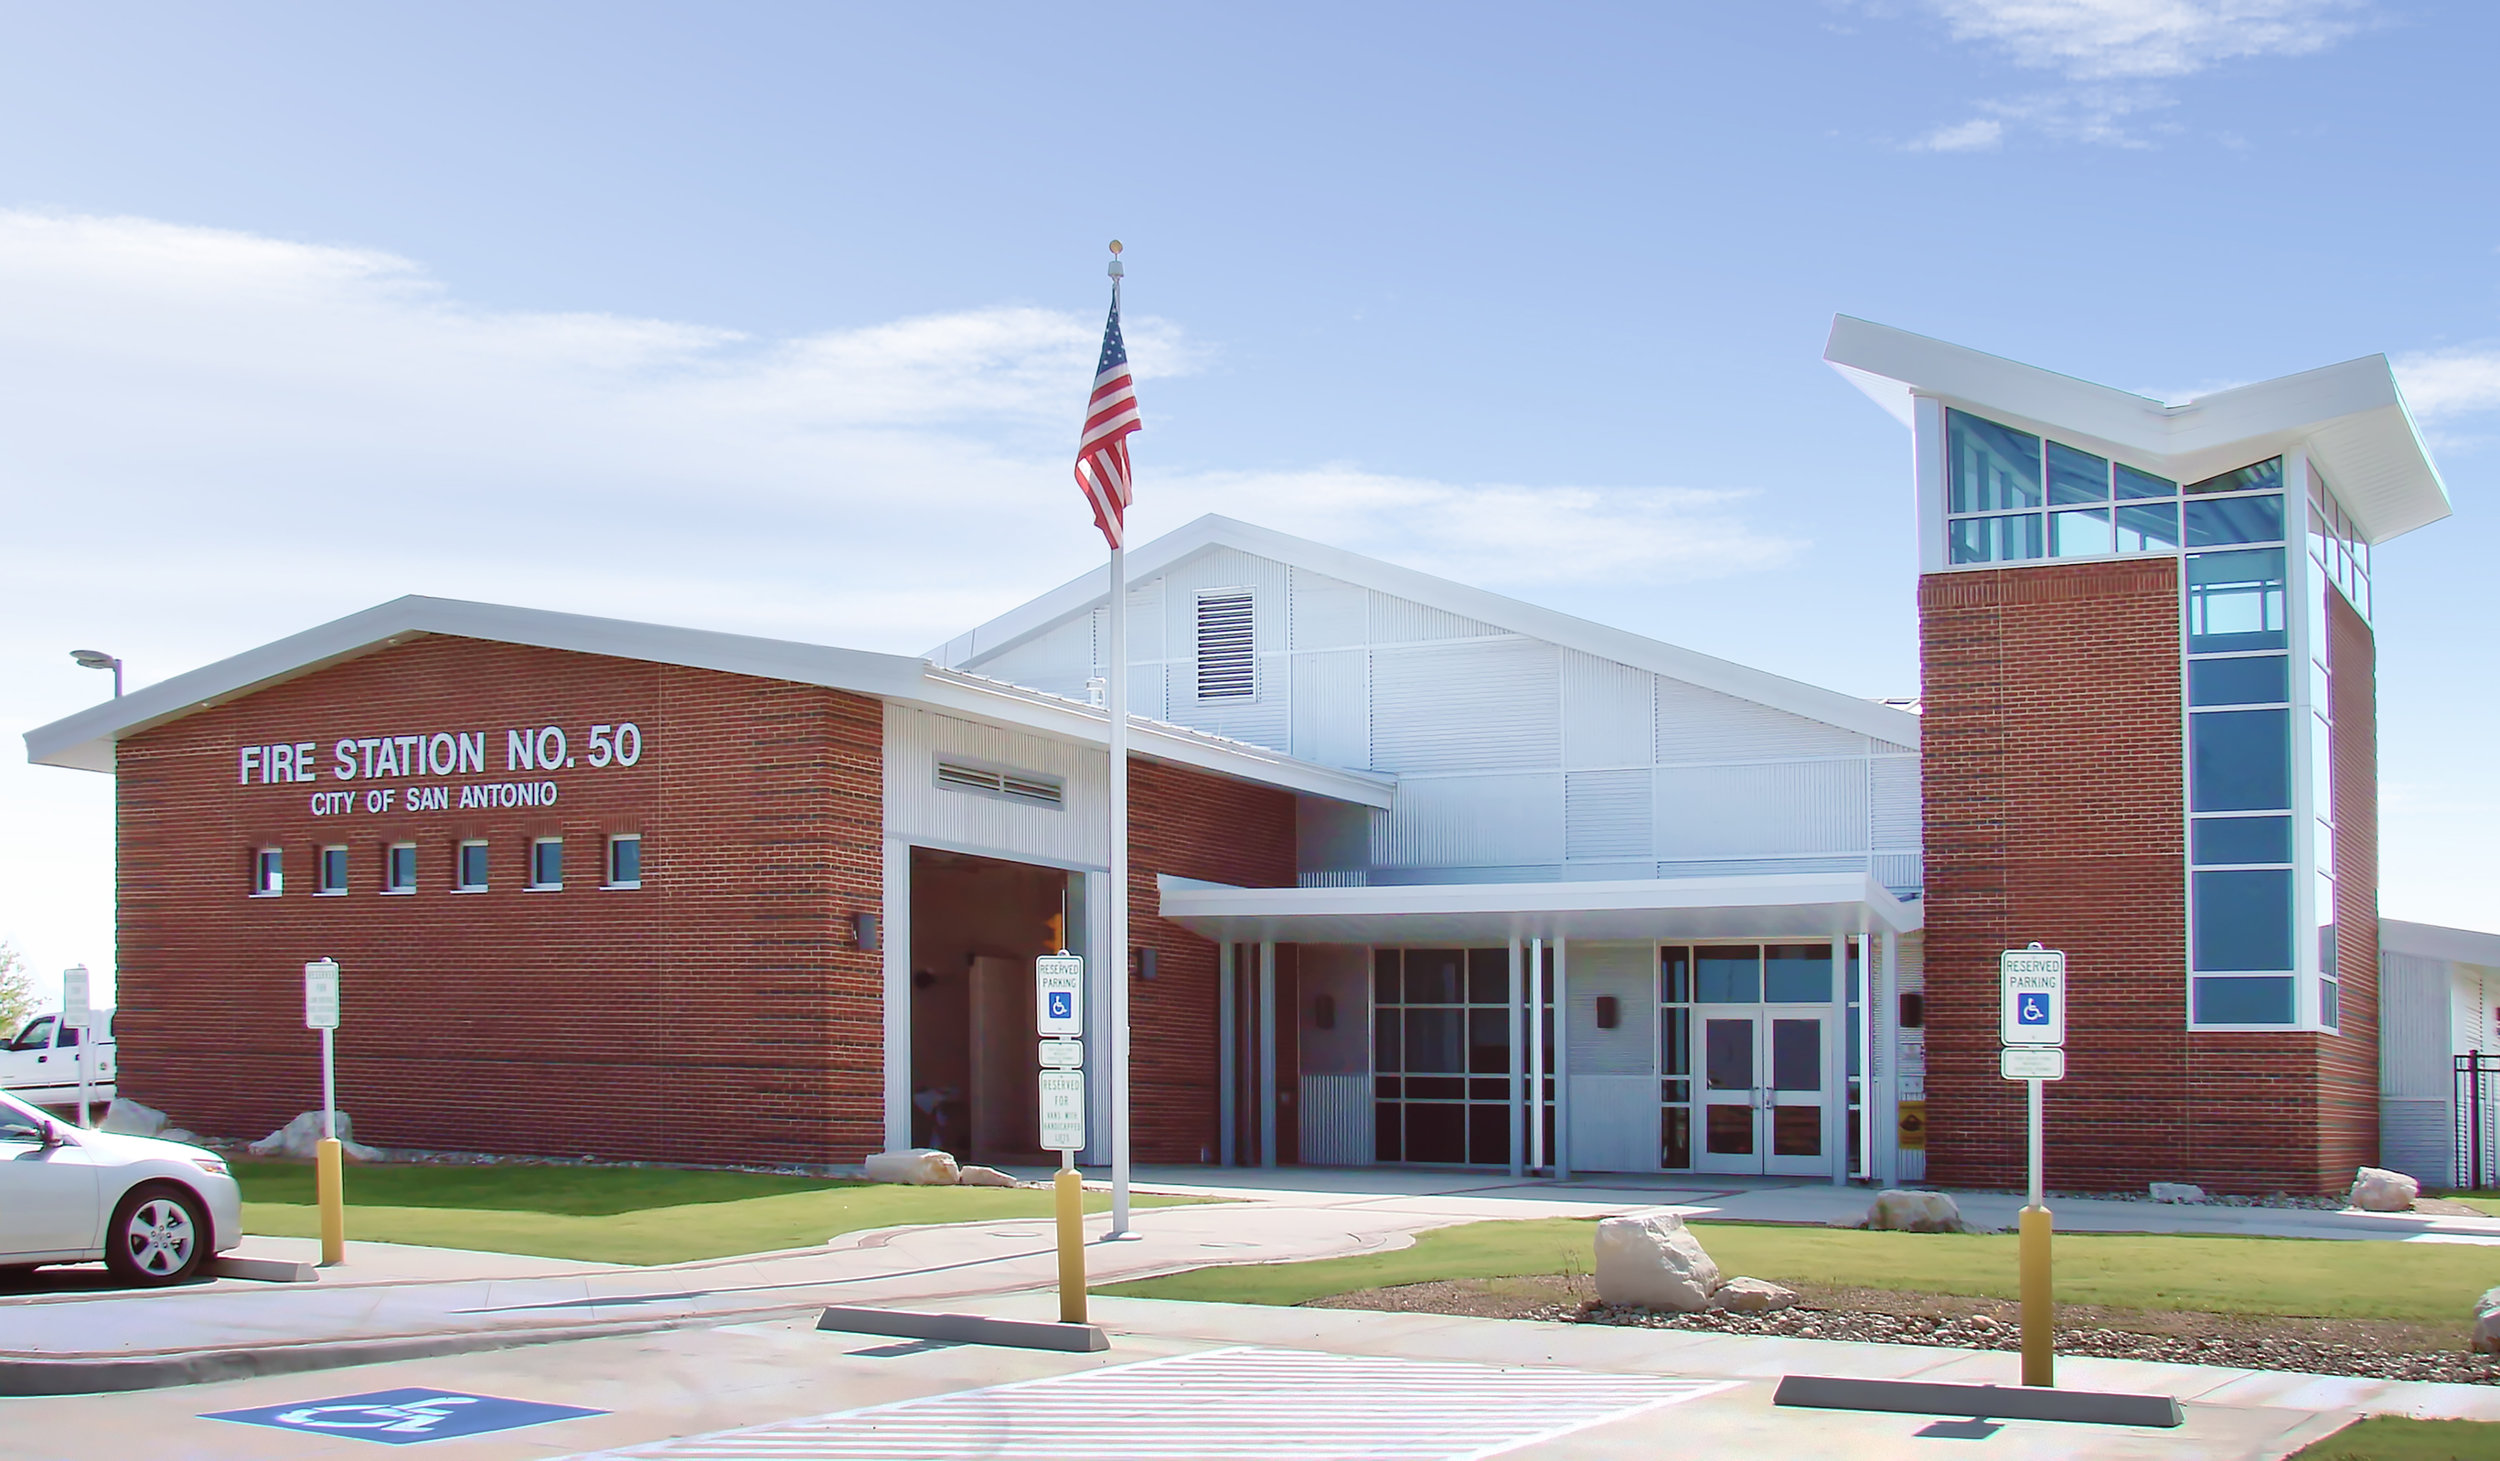 Exterior Image: City of San Antonio Fire Station No. 50 LEED Silver